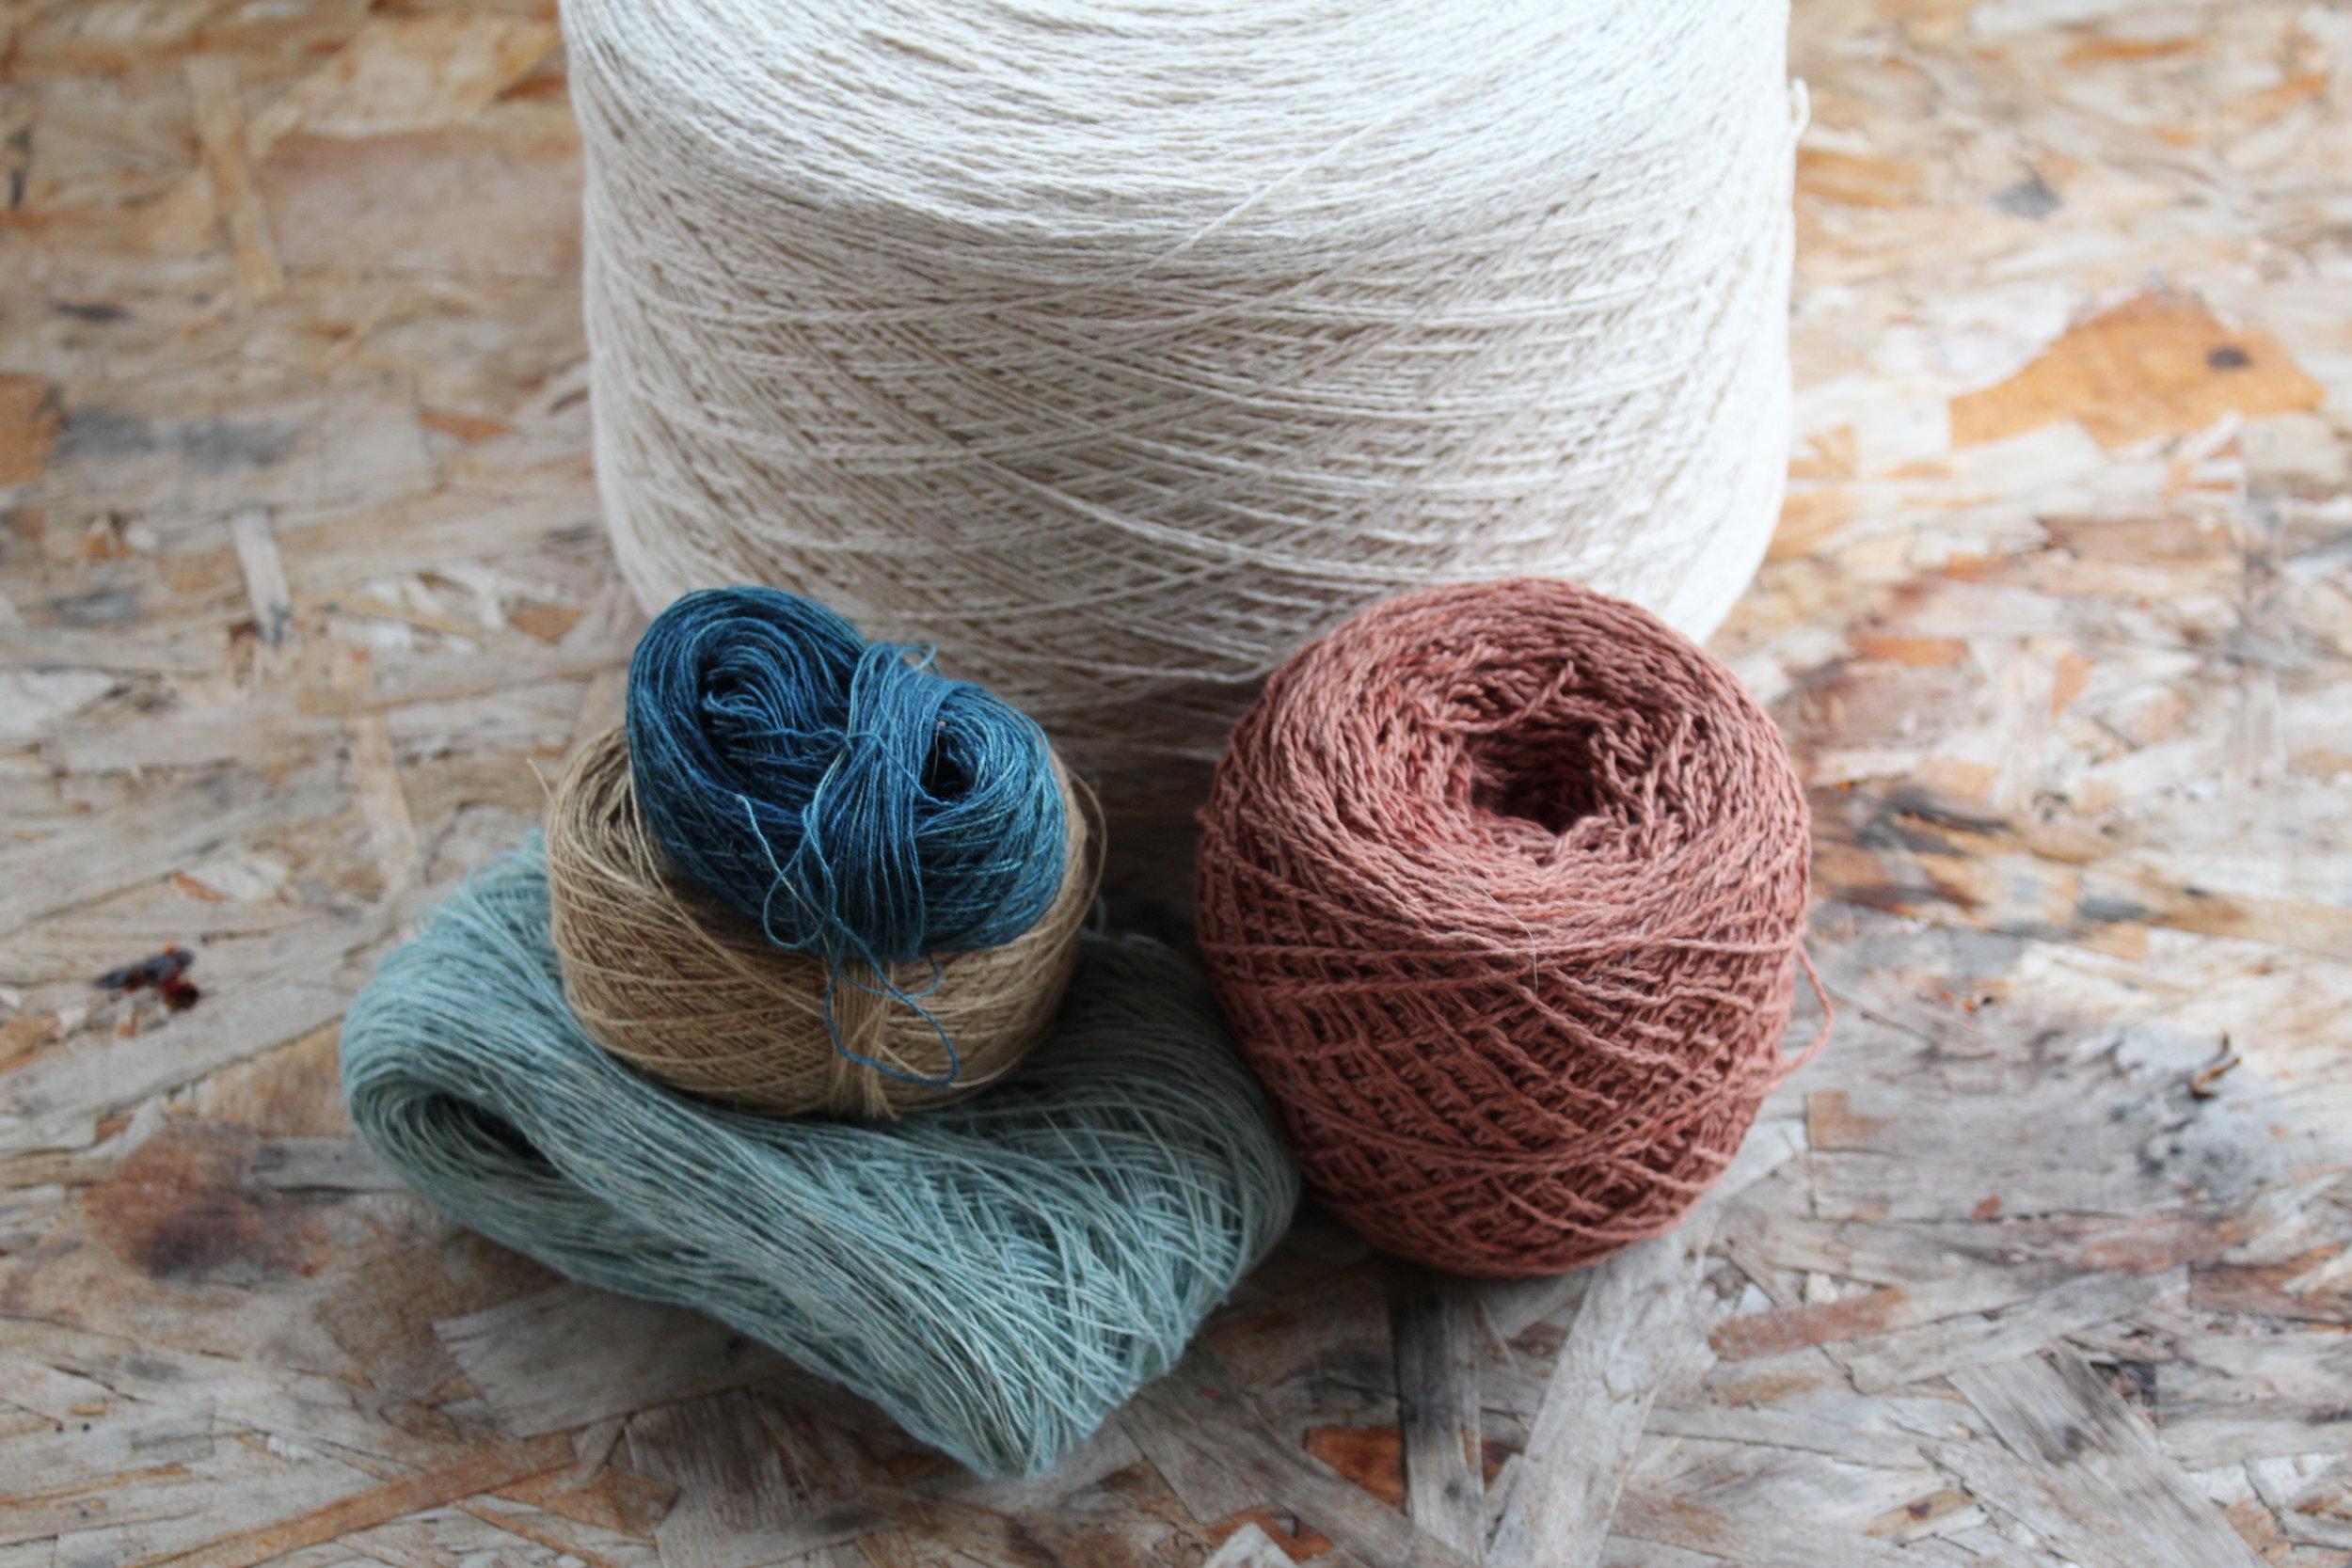 Hemp yarns. Dye work by Megan Samms and Rebekah Krahn. Photo by Megan Samms.